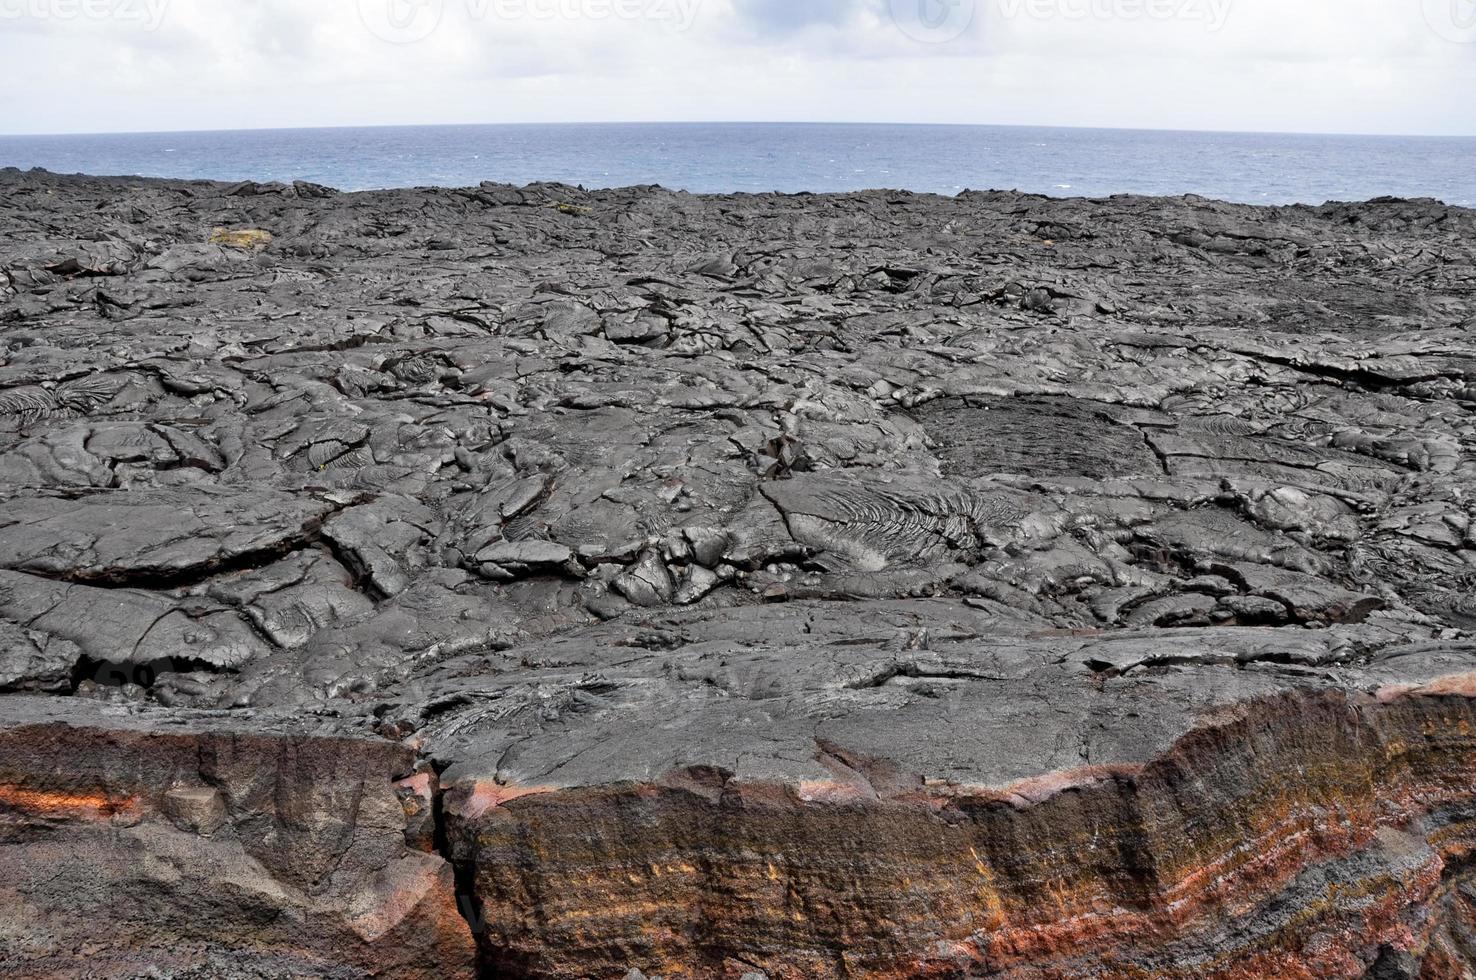 lavaveld, Hawaii Volcanoes National Park (VS) foto